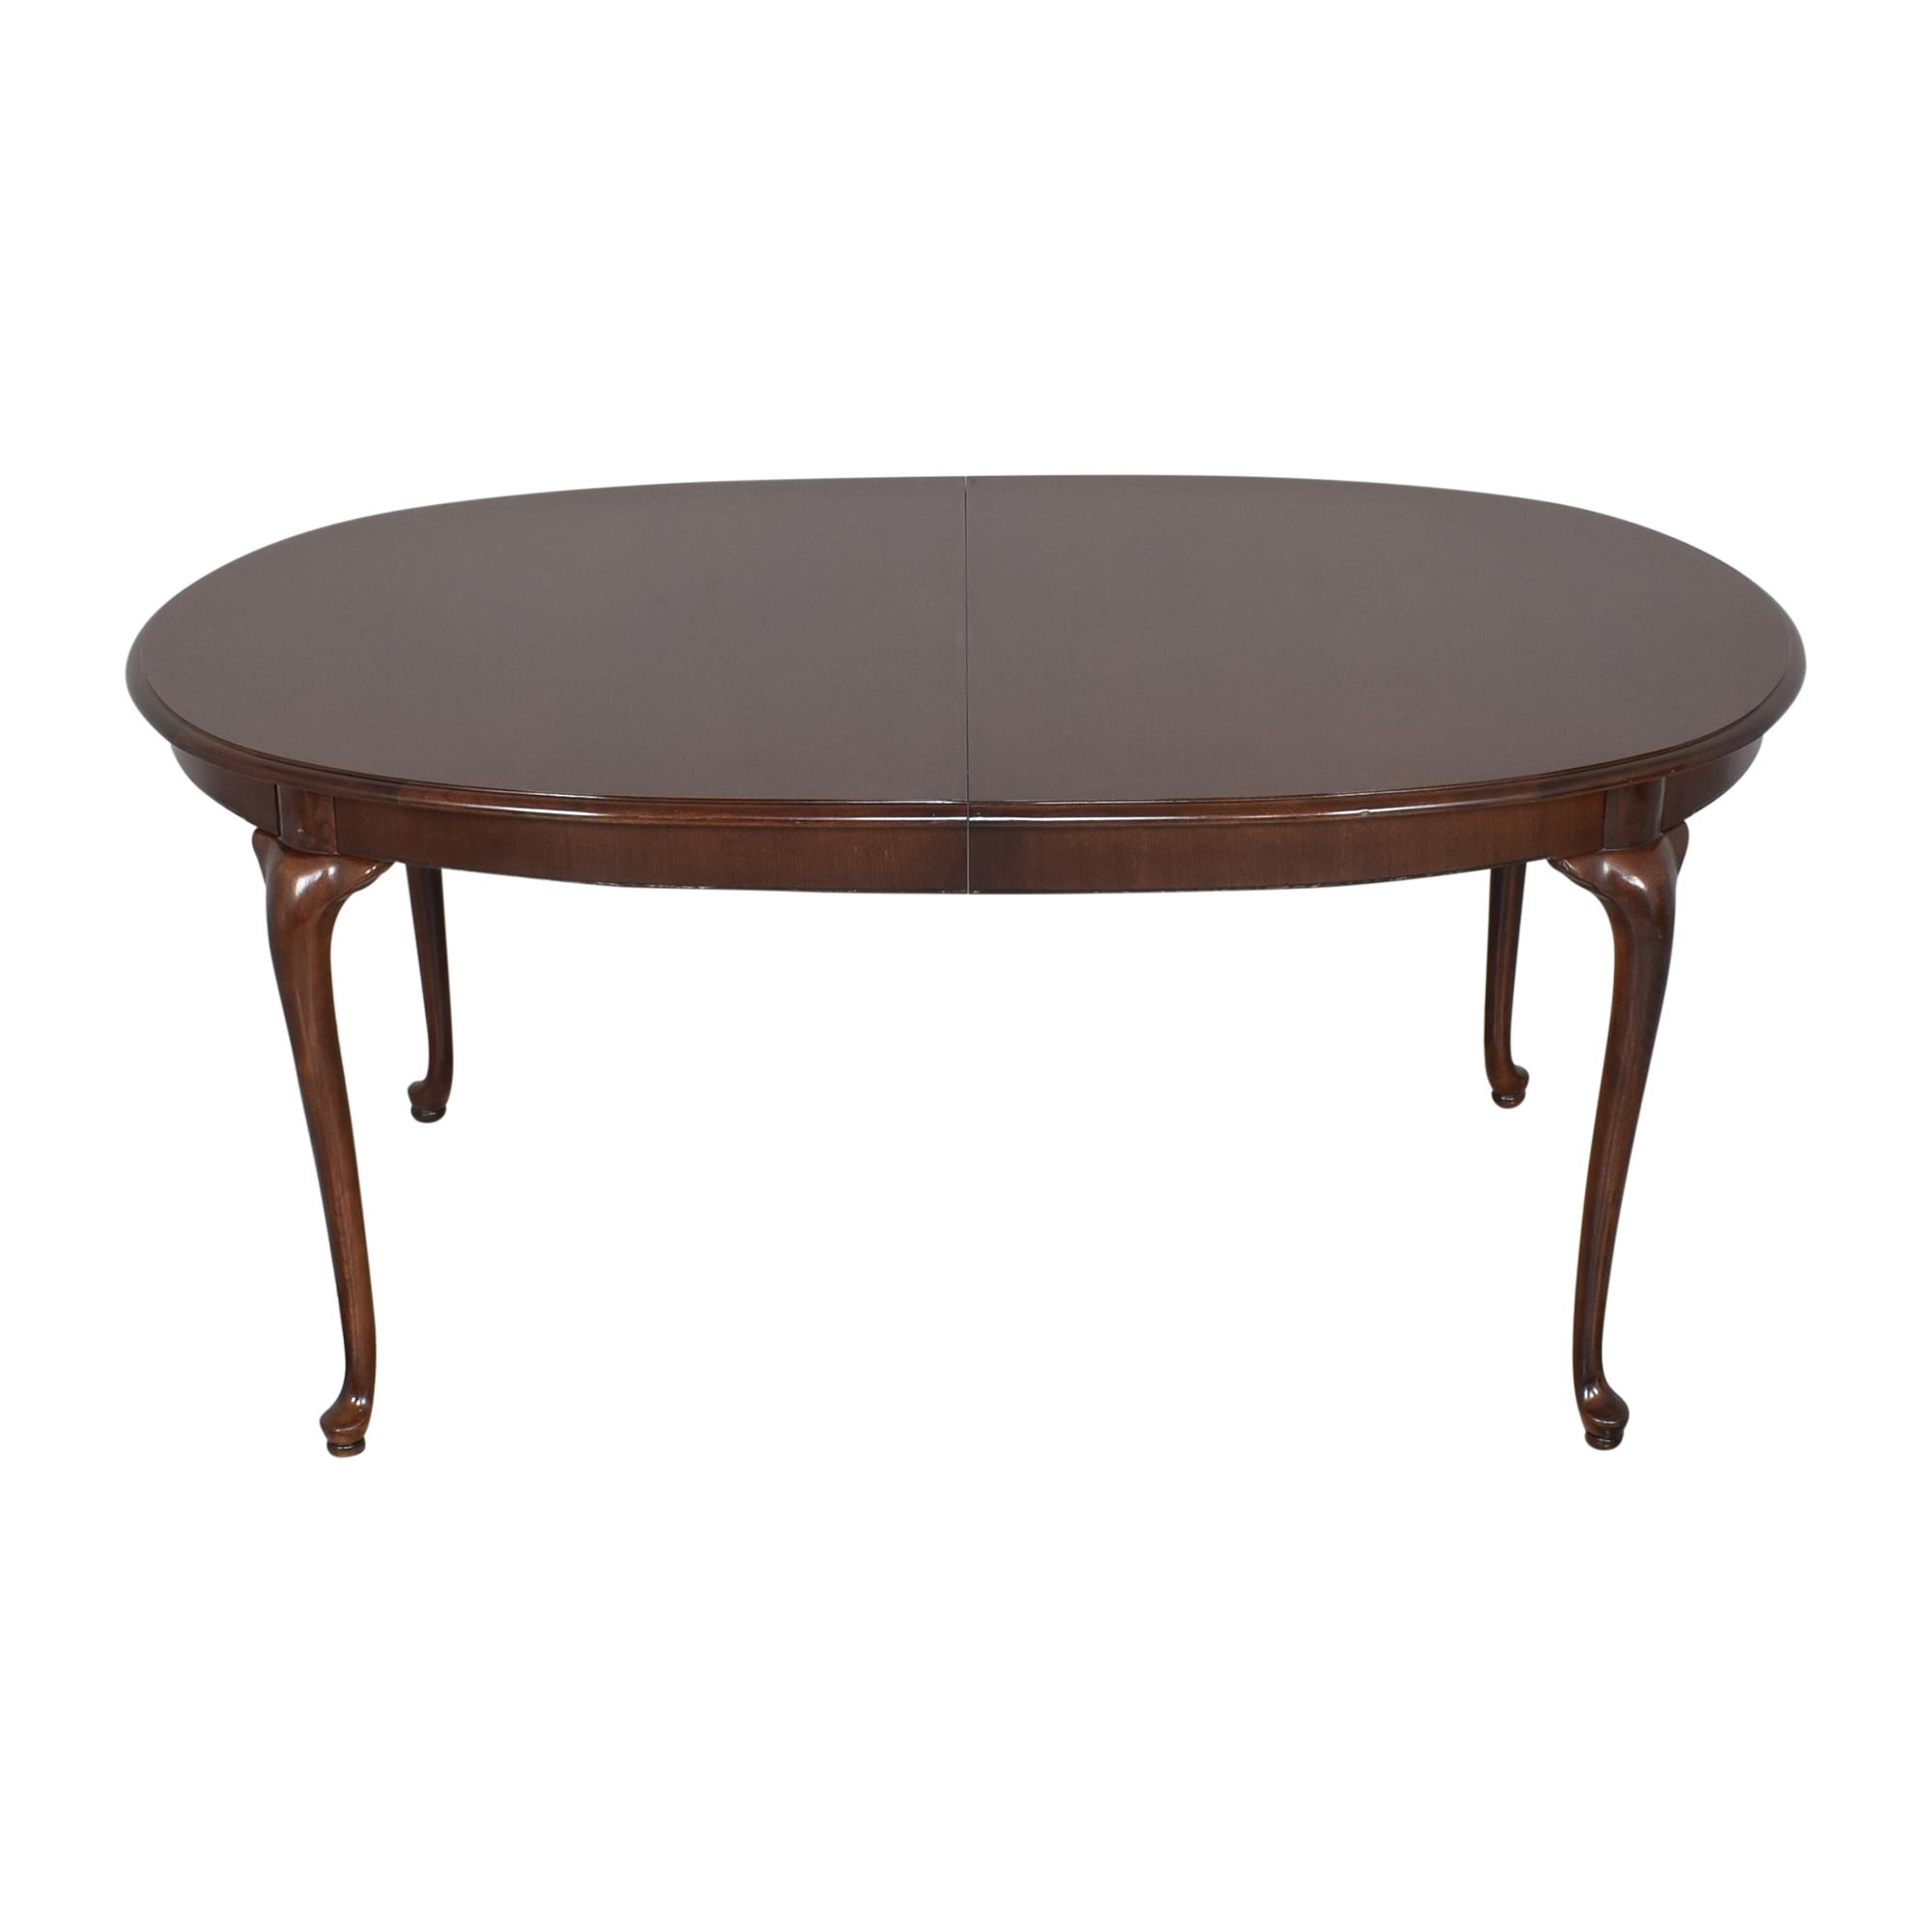 Thomasville Thomasville Queen Anne Extendable Dining Table dark brown